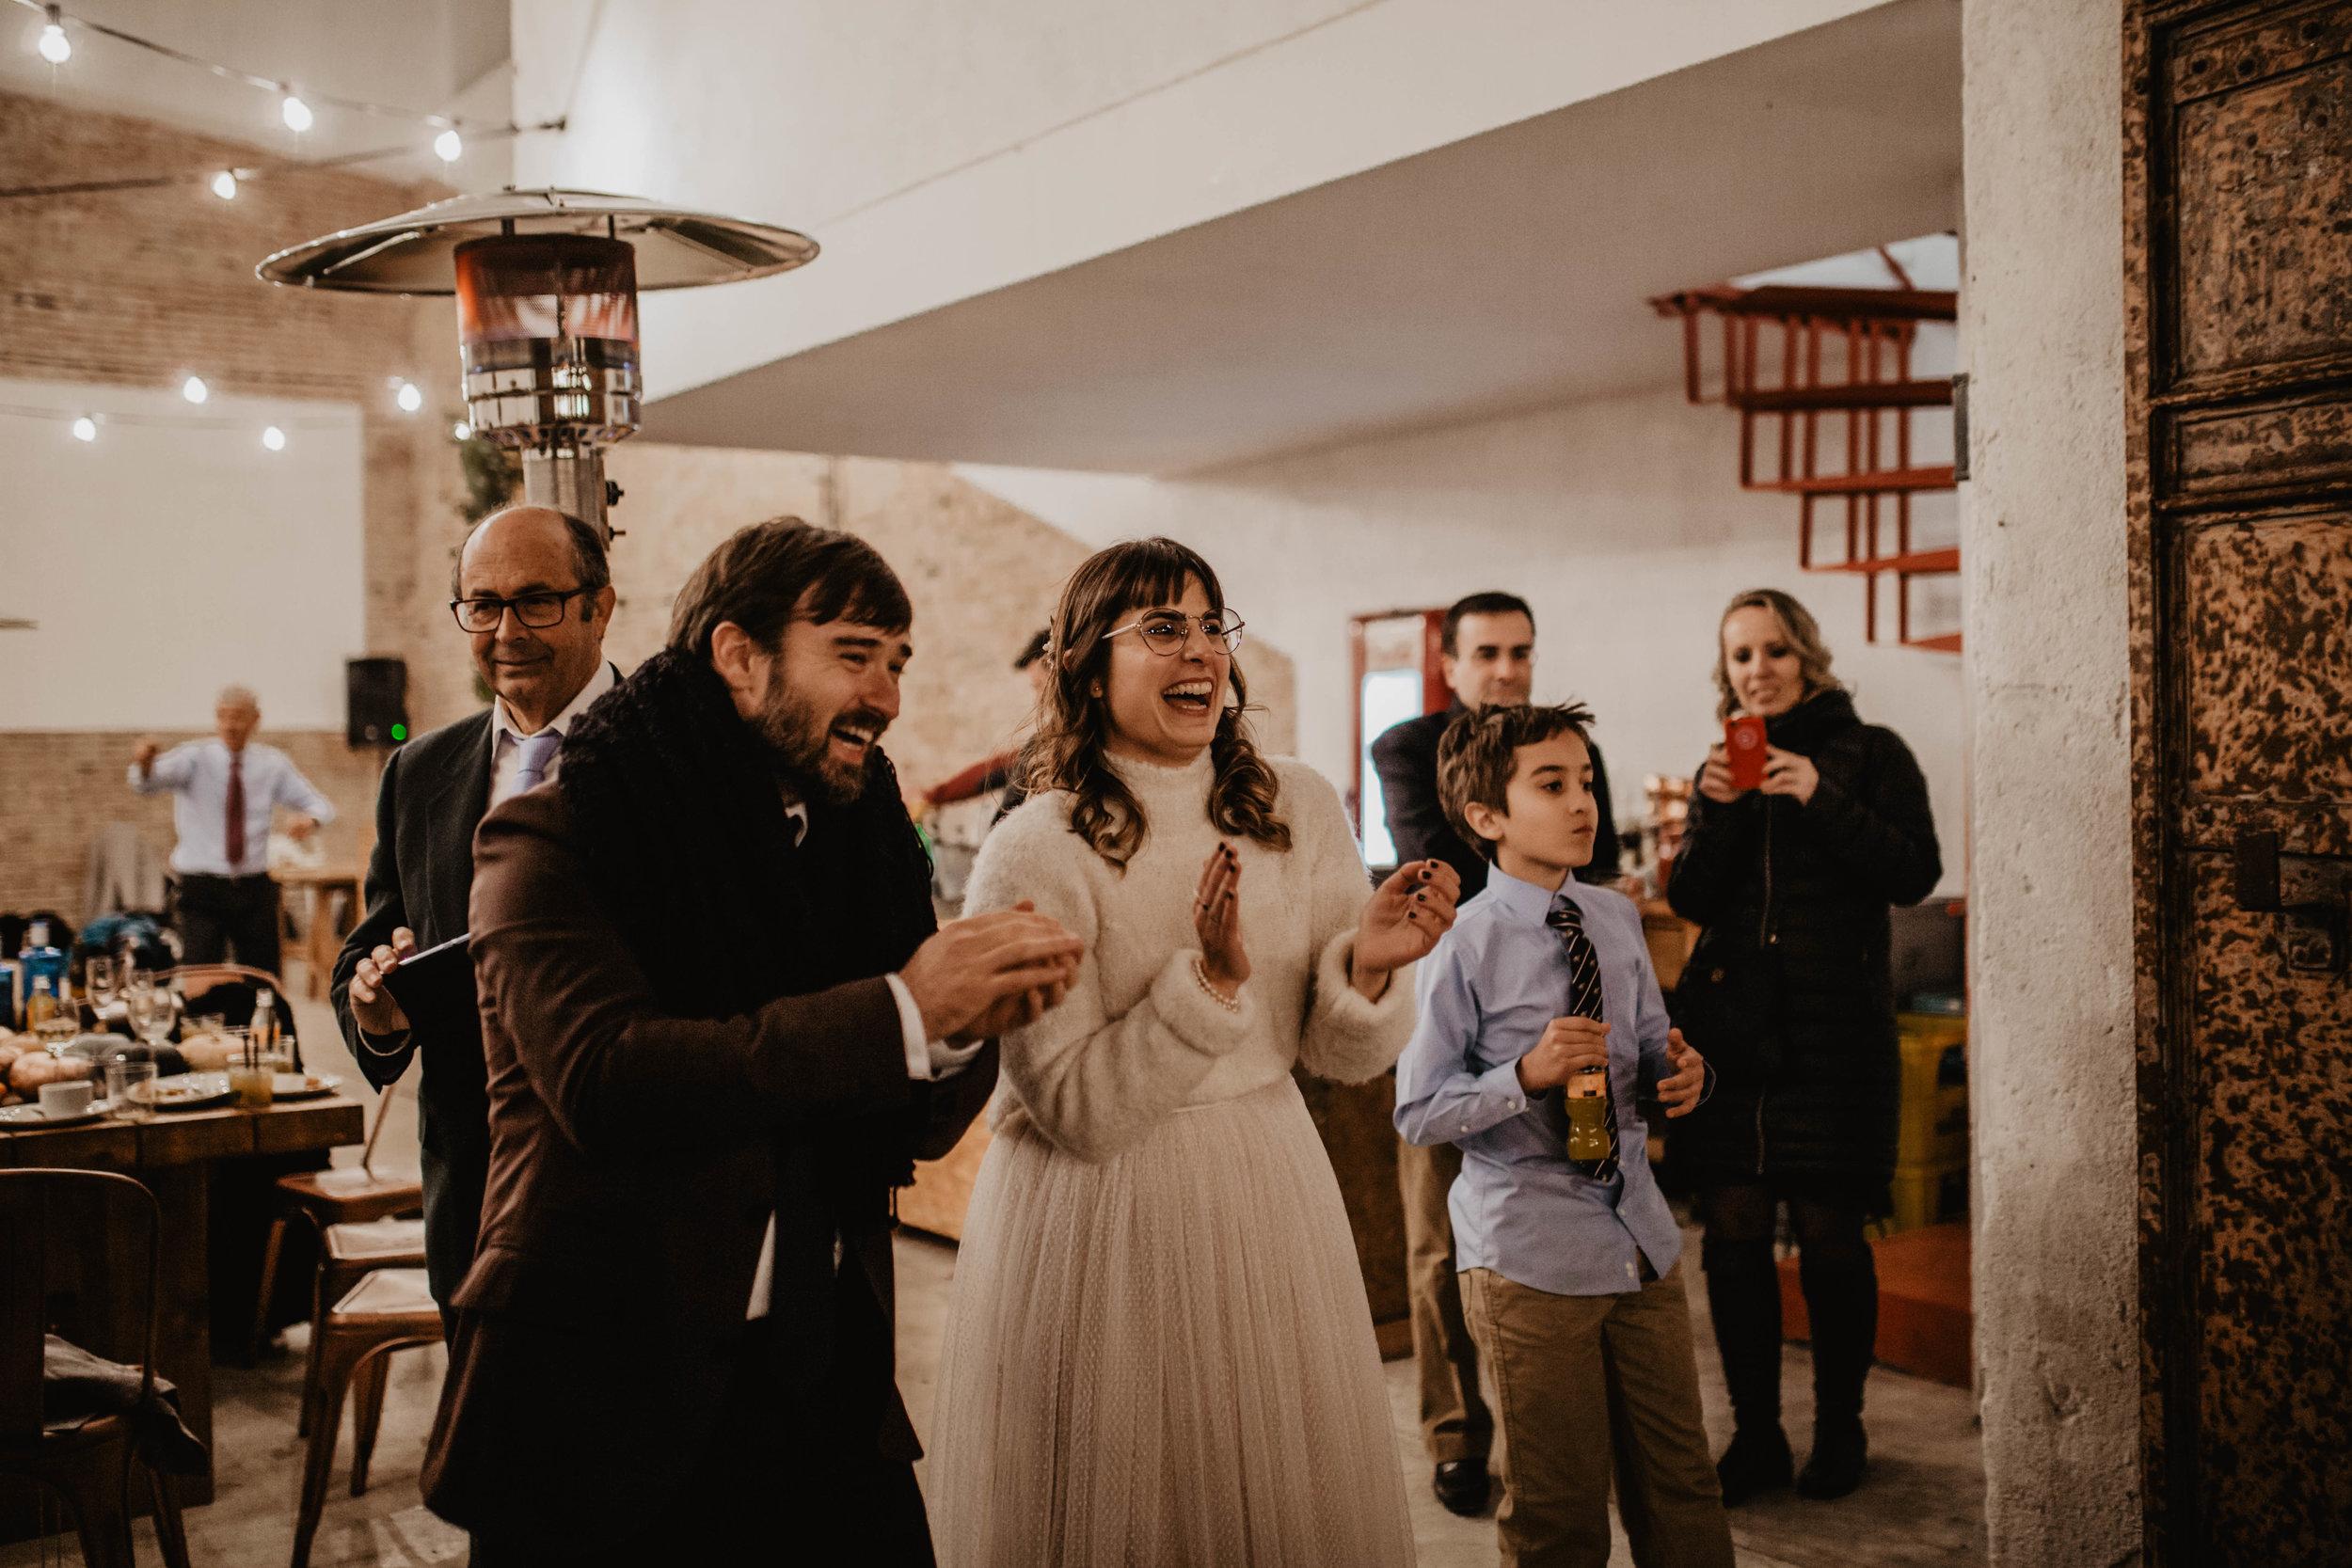 thenortherngirlphotography-photography-weddingphotography-couple-bodasconestilo-bodasenbarcelona-martadavid-1133.jpg